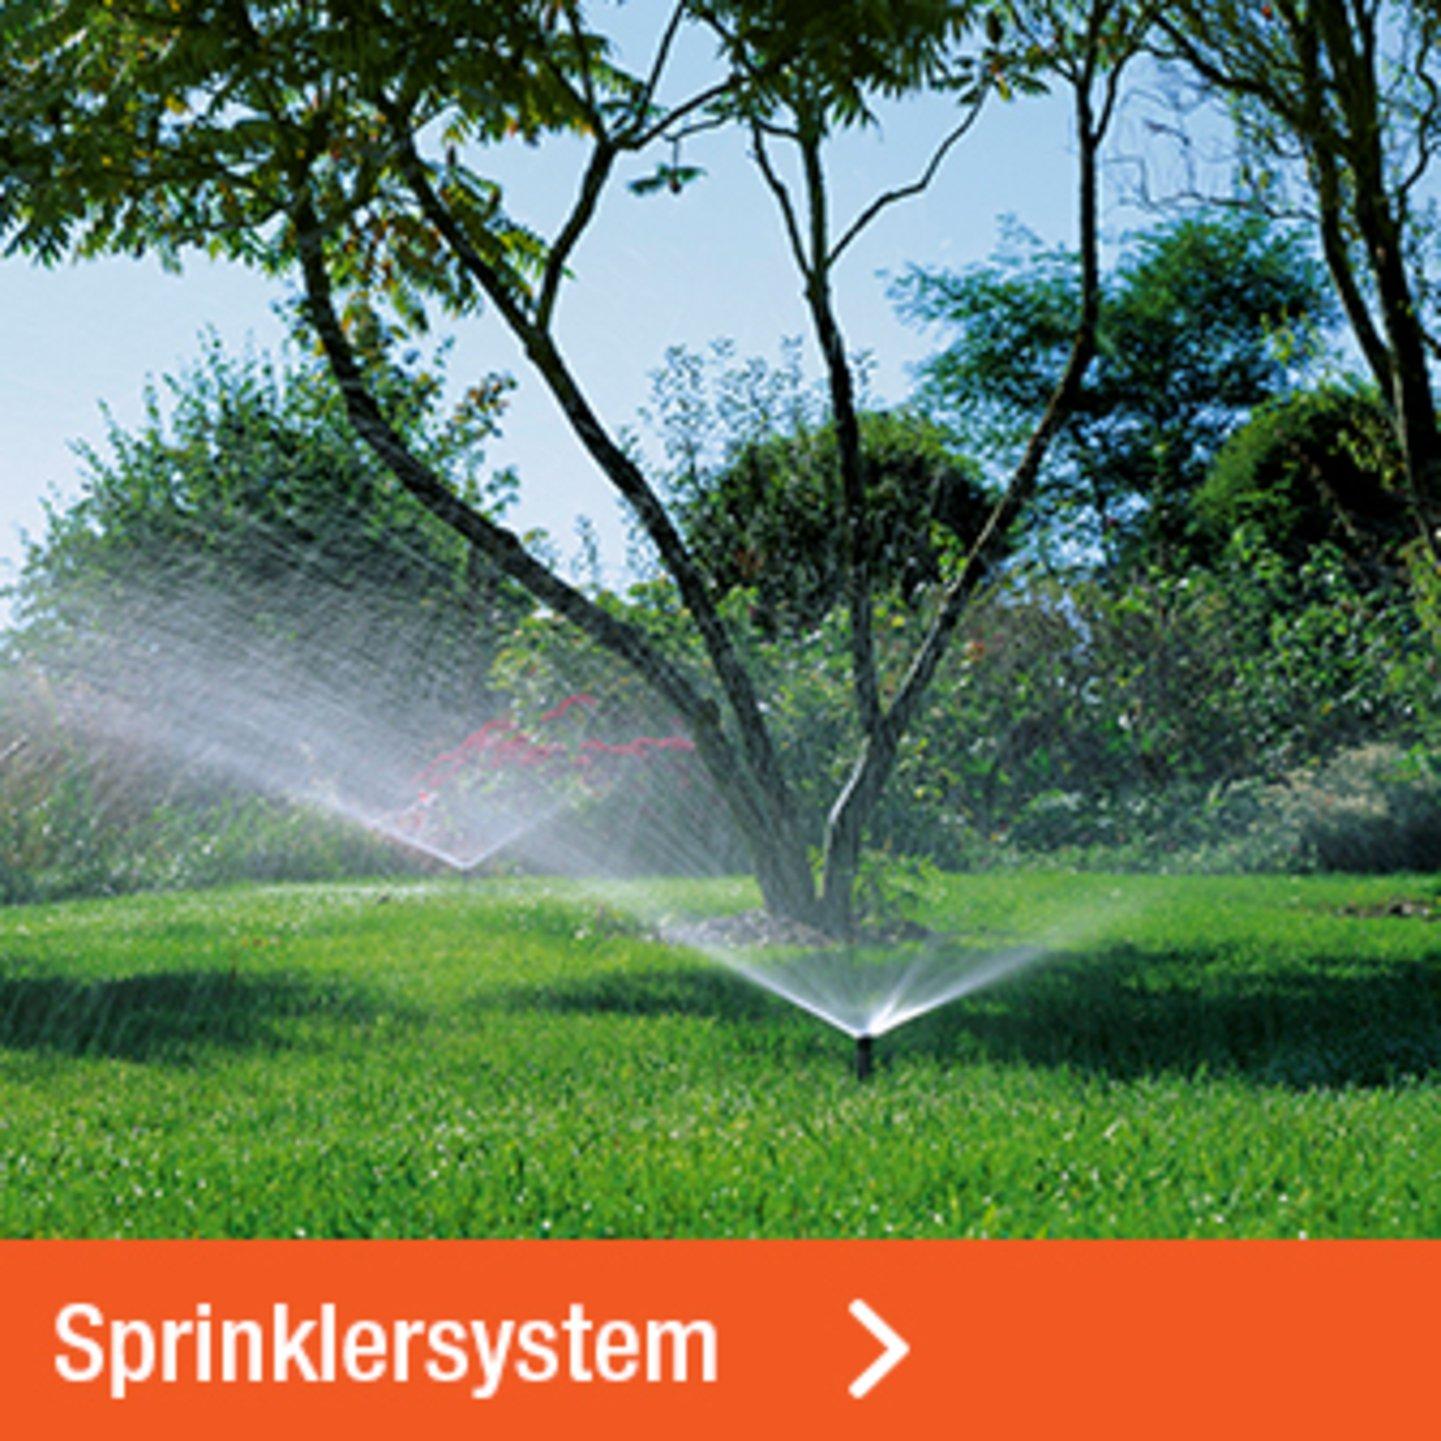 Sprinklersystem